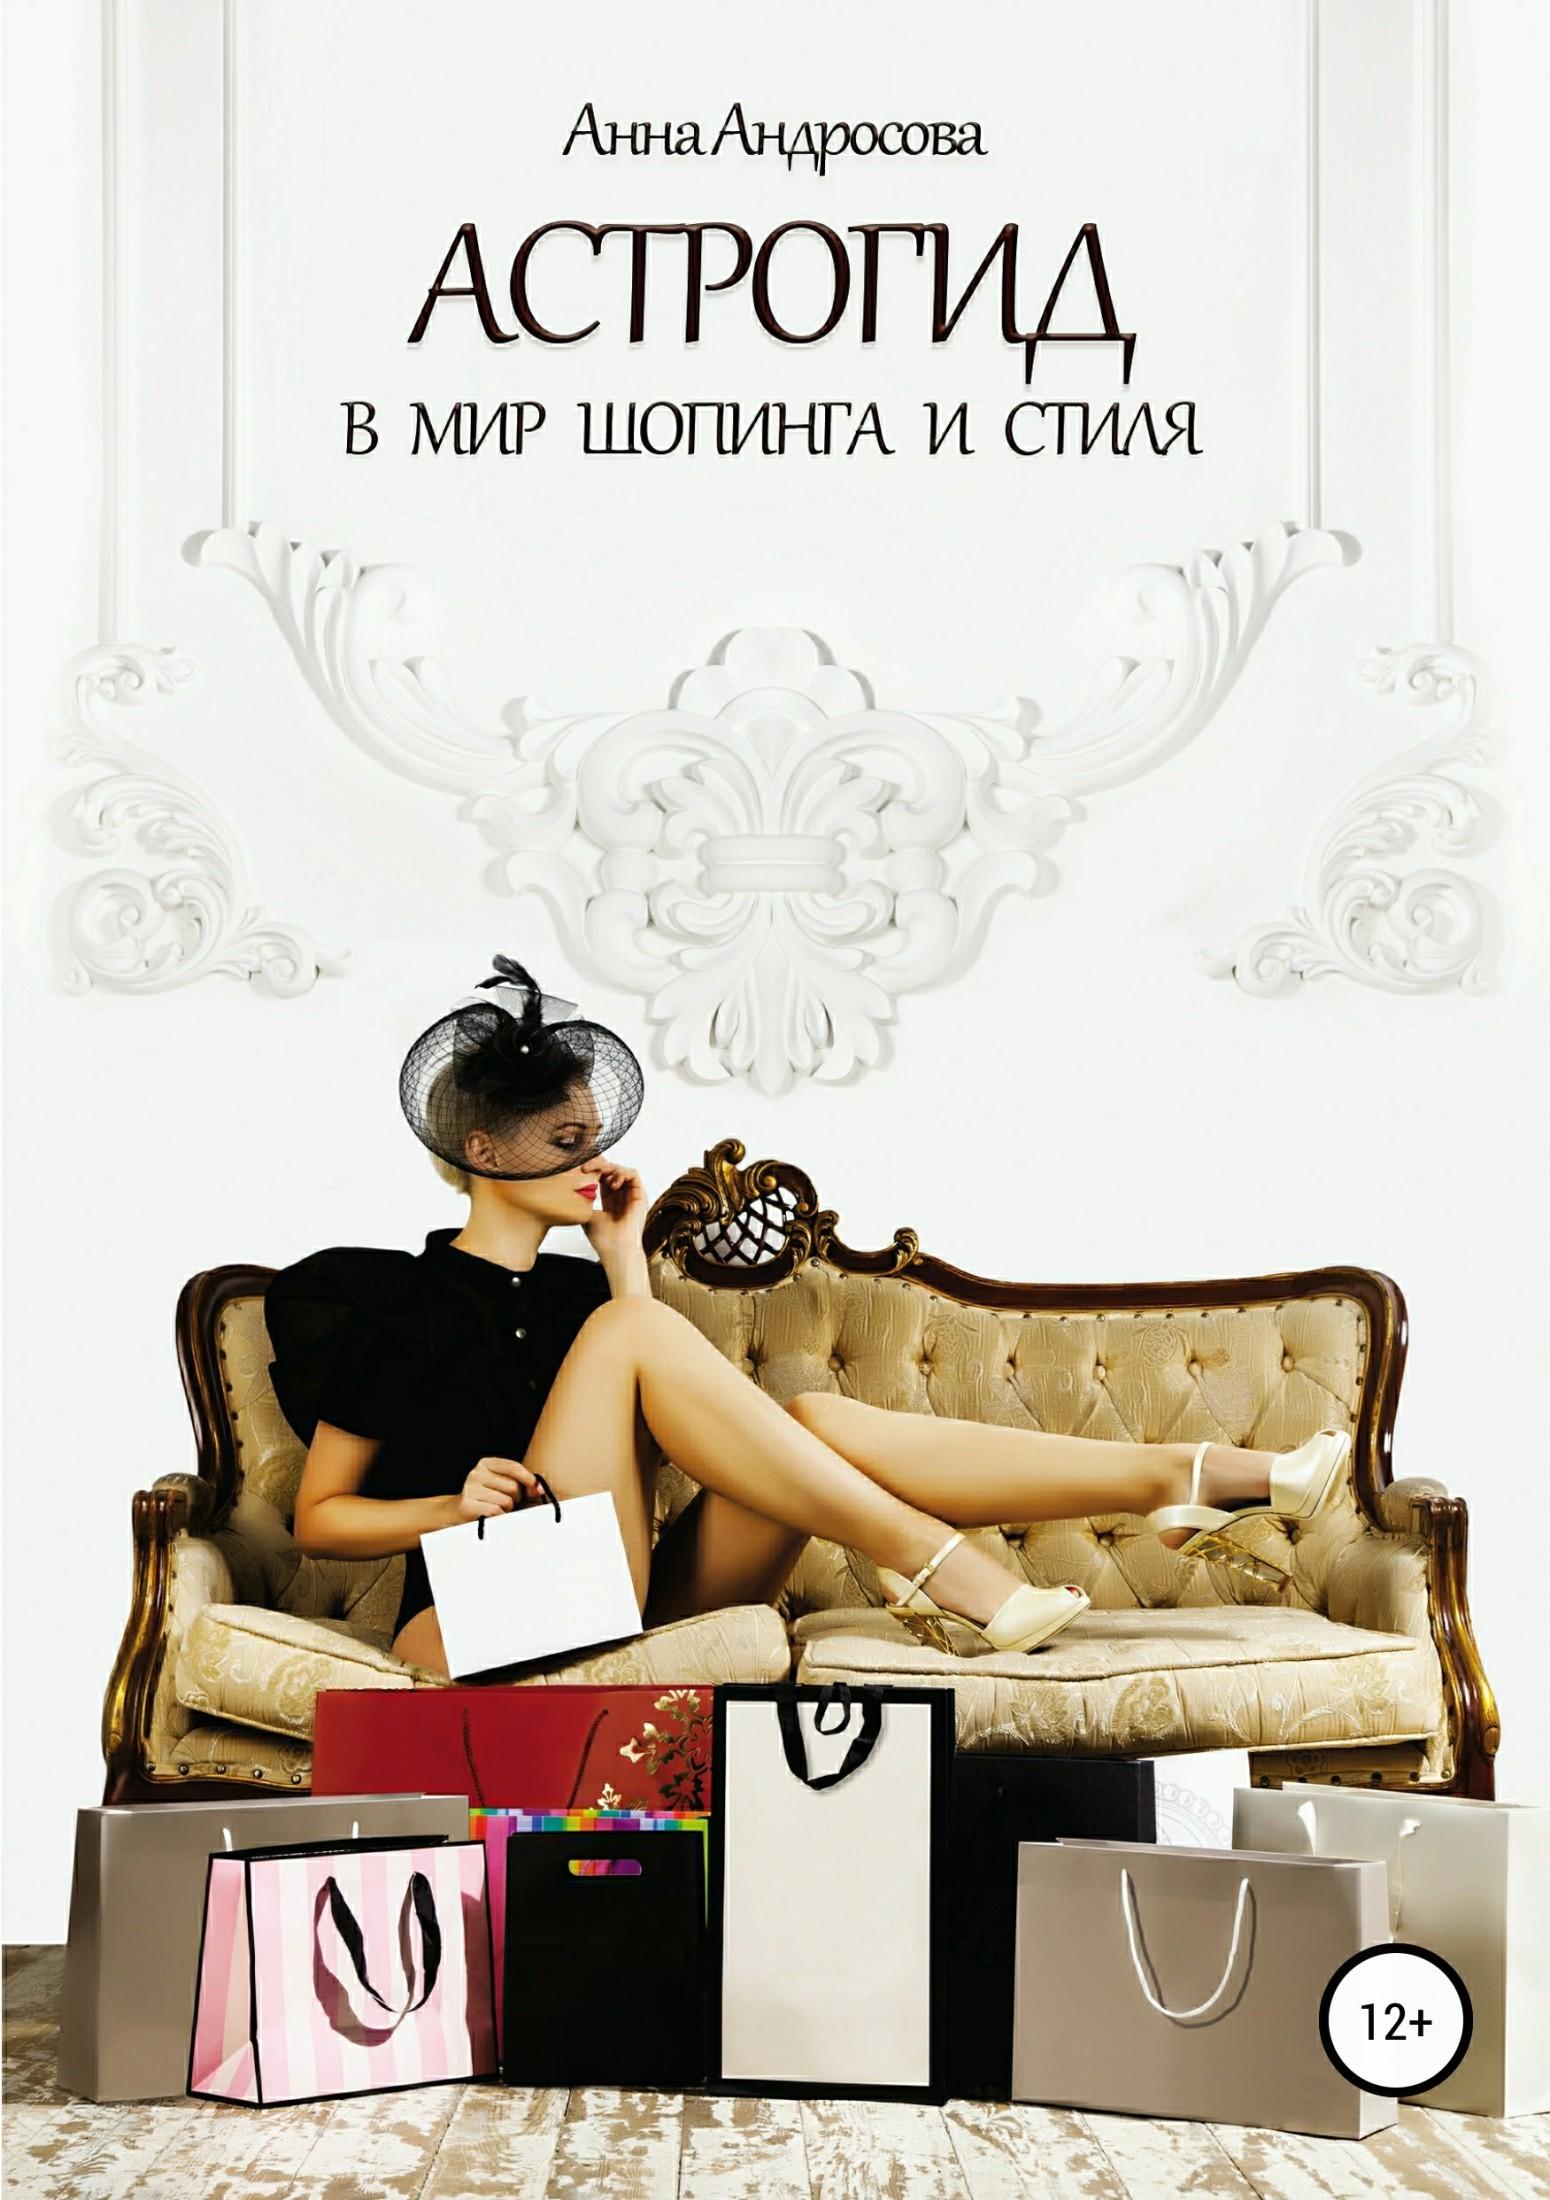 Обложка книги. Автор - Анна Андросова